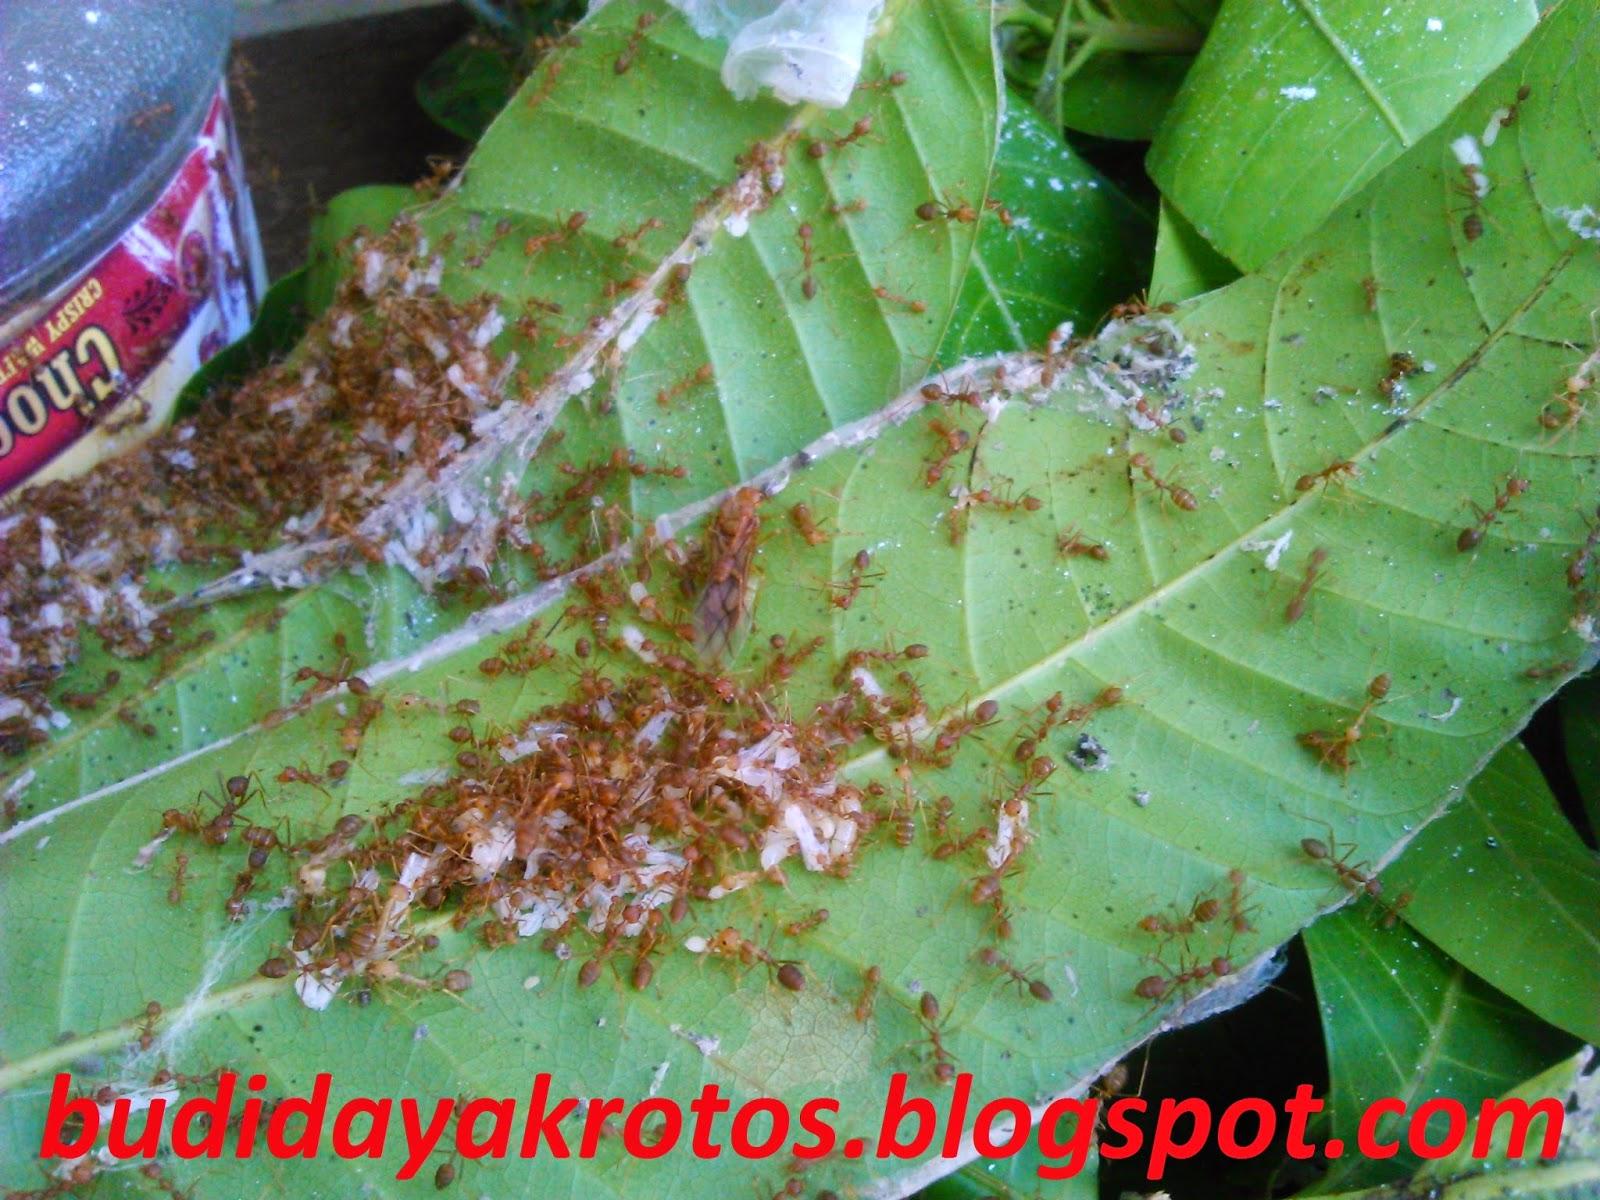 Berapa Lama Adaptasi Semut Rangrang dari Alam ke Sarang Toples?